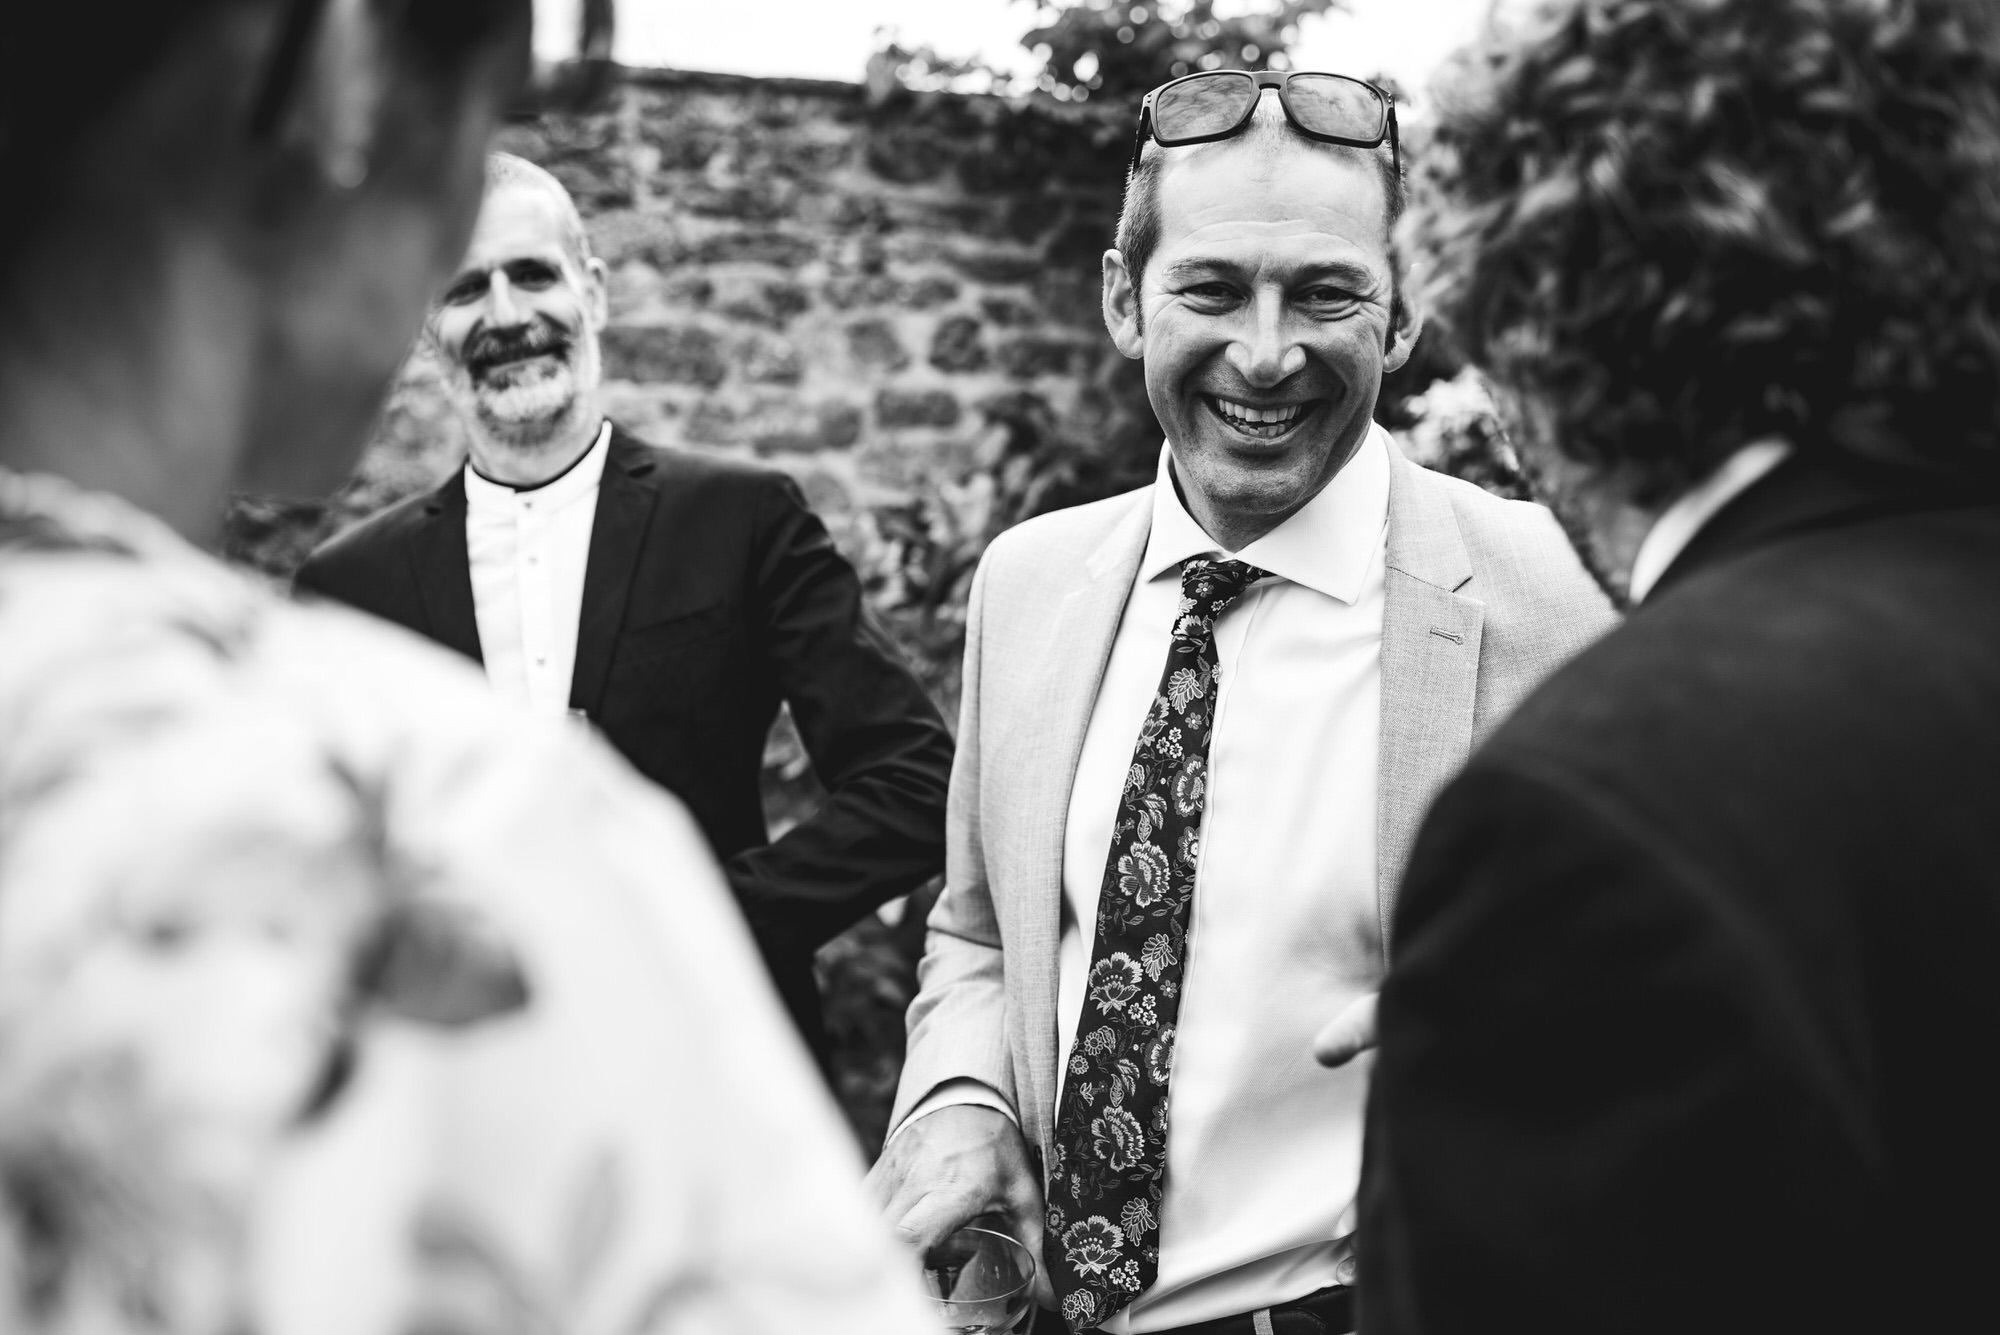 Dorset marquee wedding by the sea simon biffen photography 37